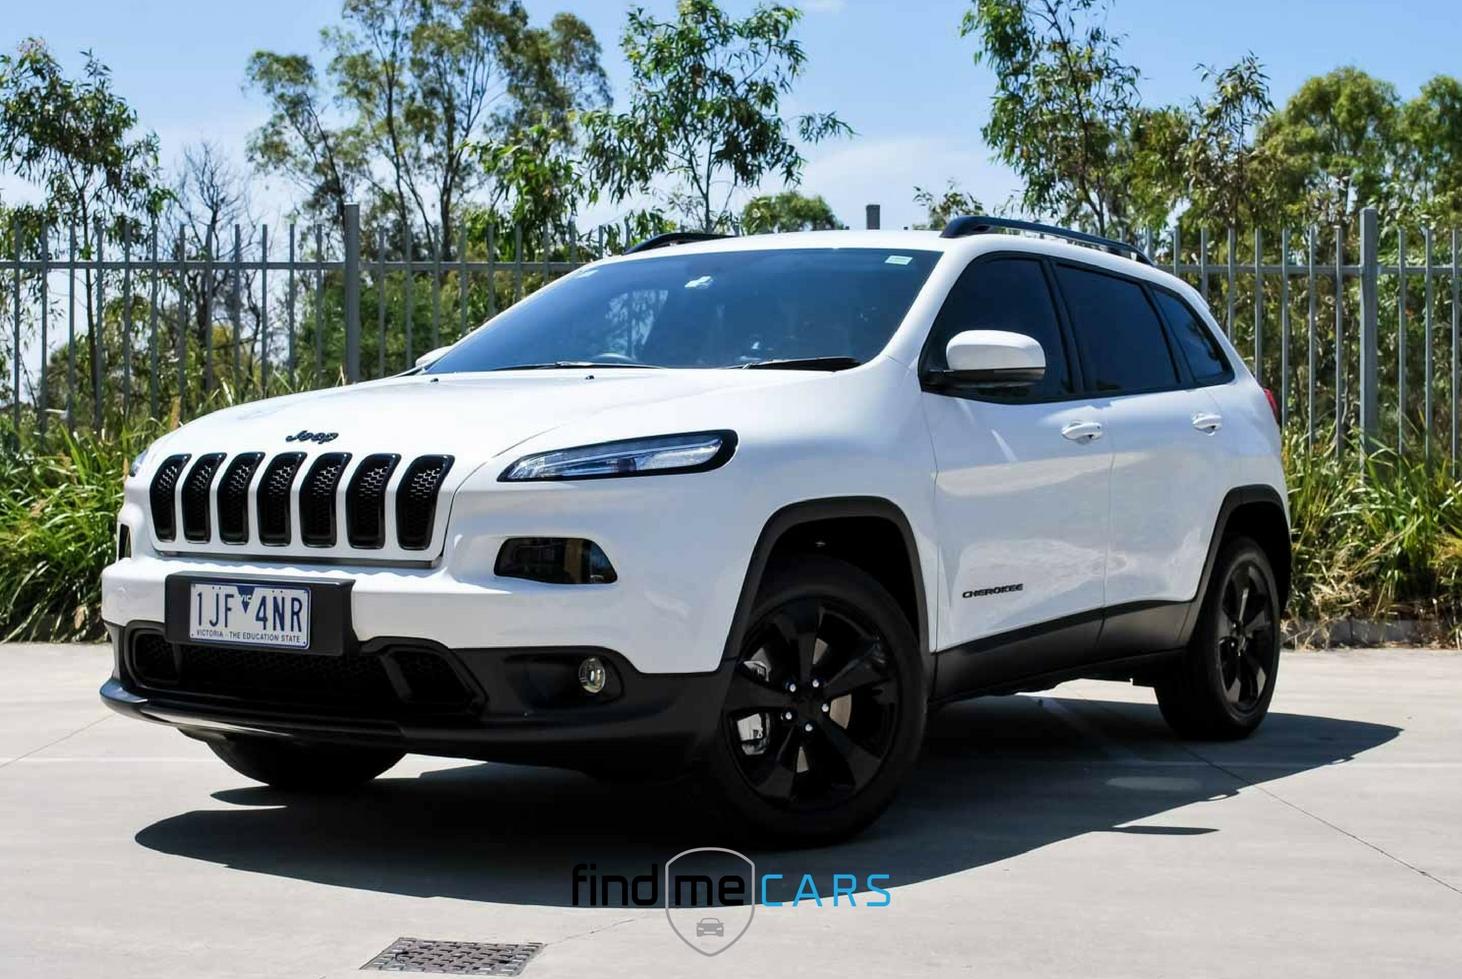 2015 Jeep Cherokee Blackhawk 4x4 Find Me Cars